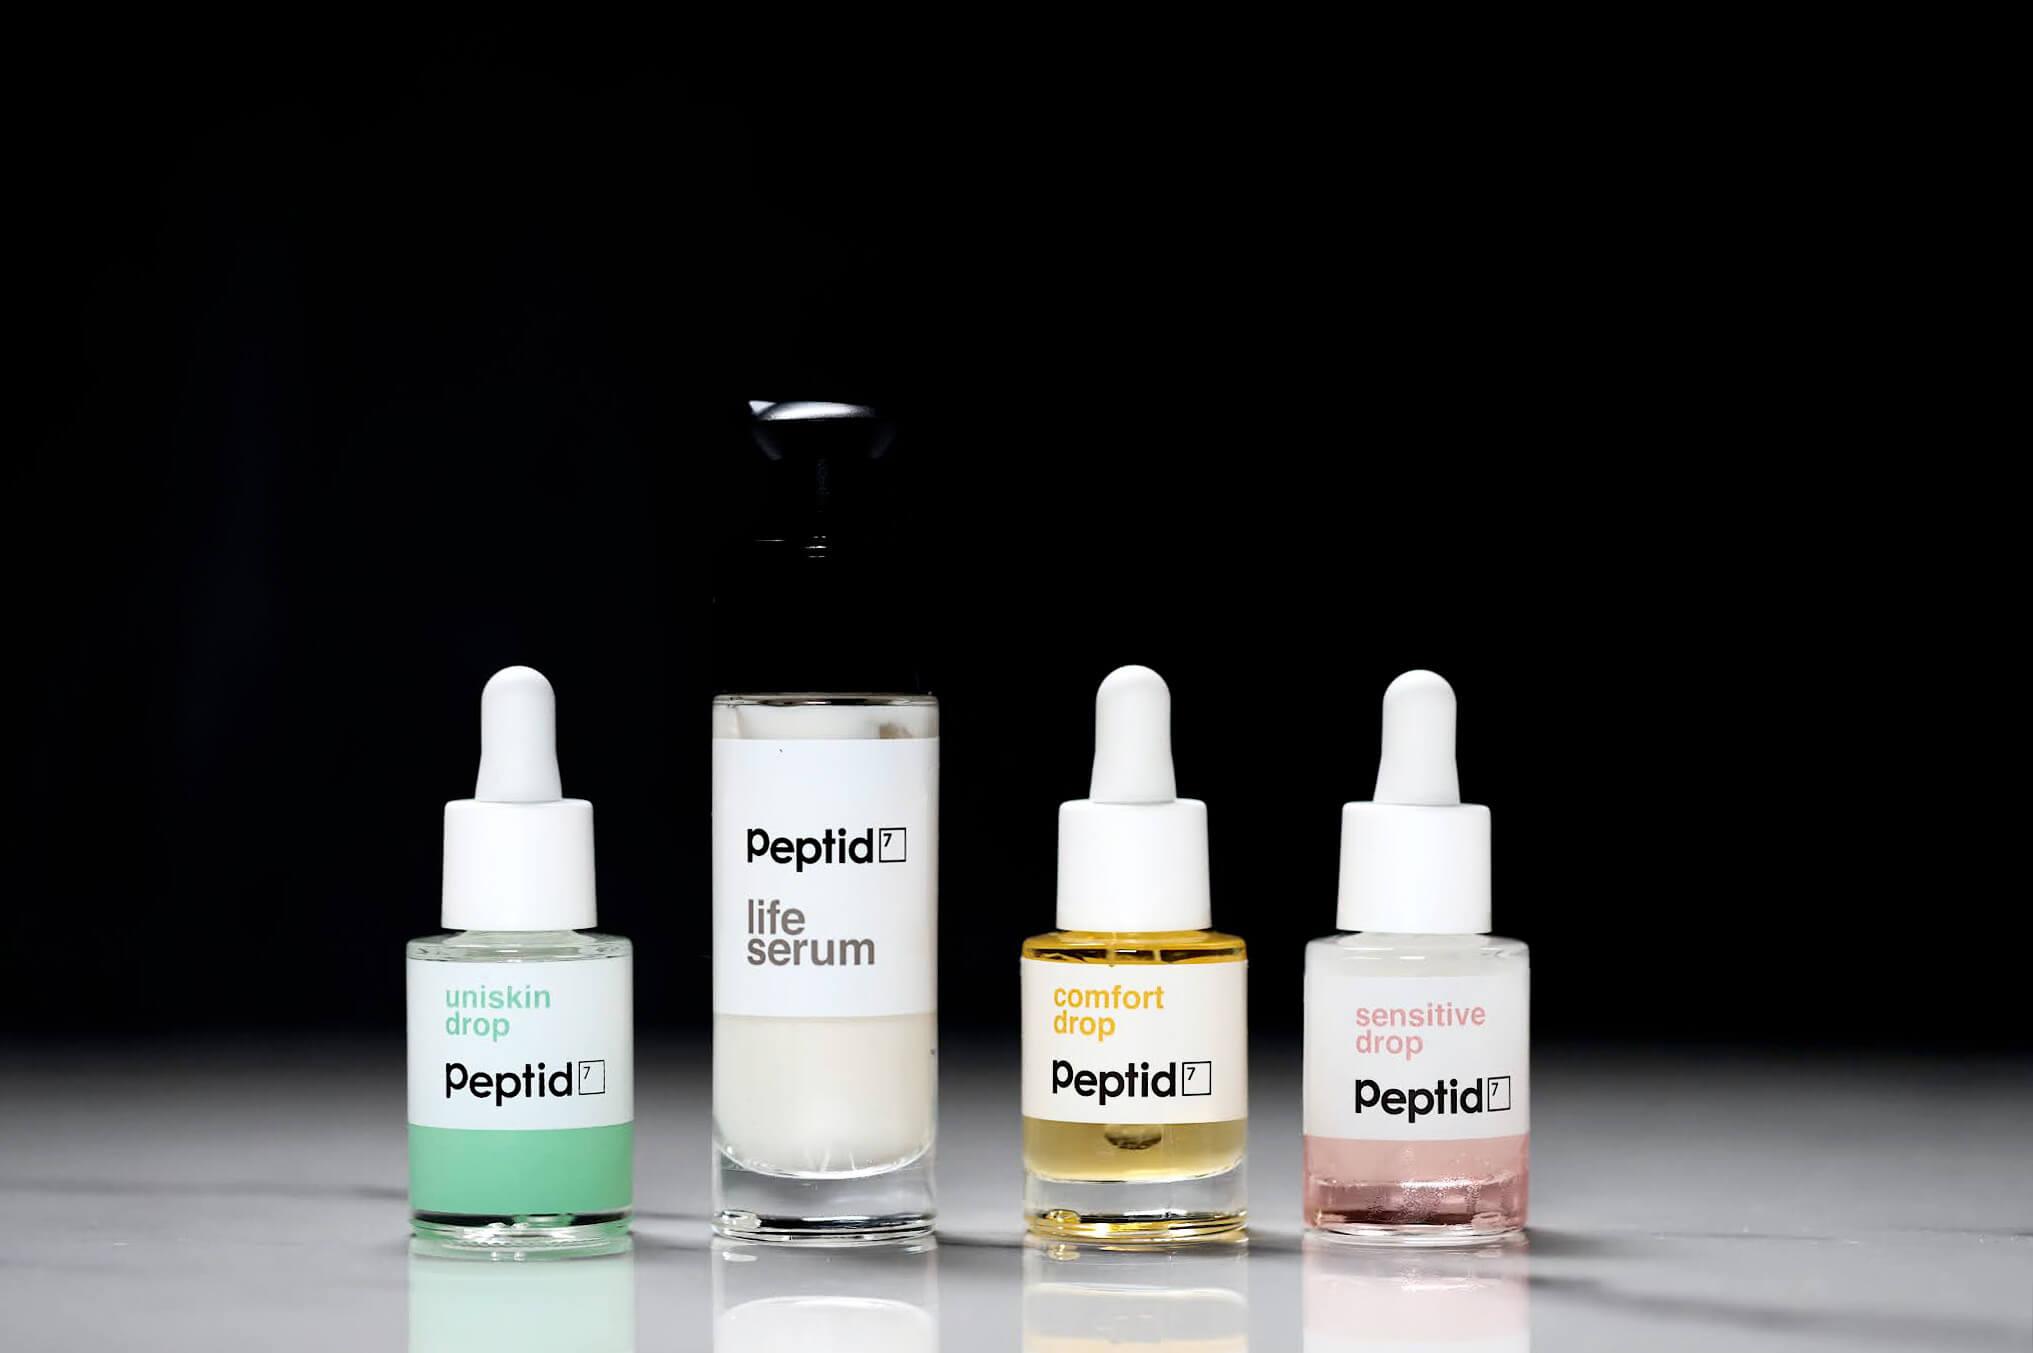 Peptid7 soins visage serum avis